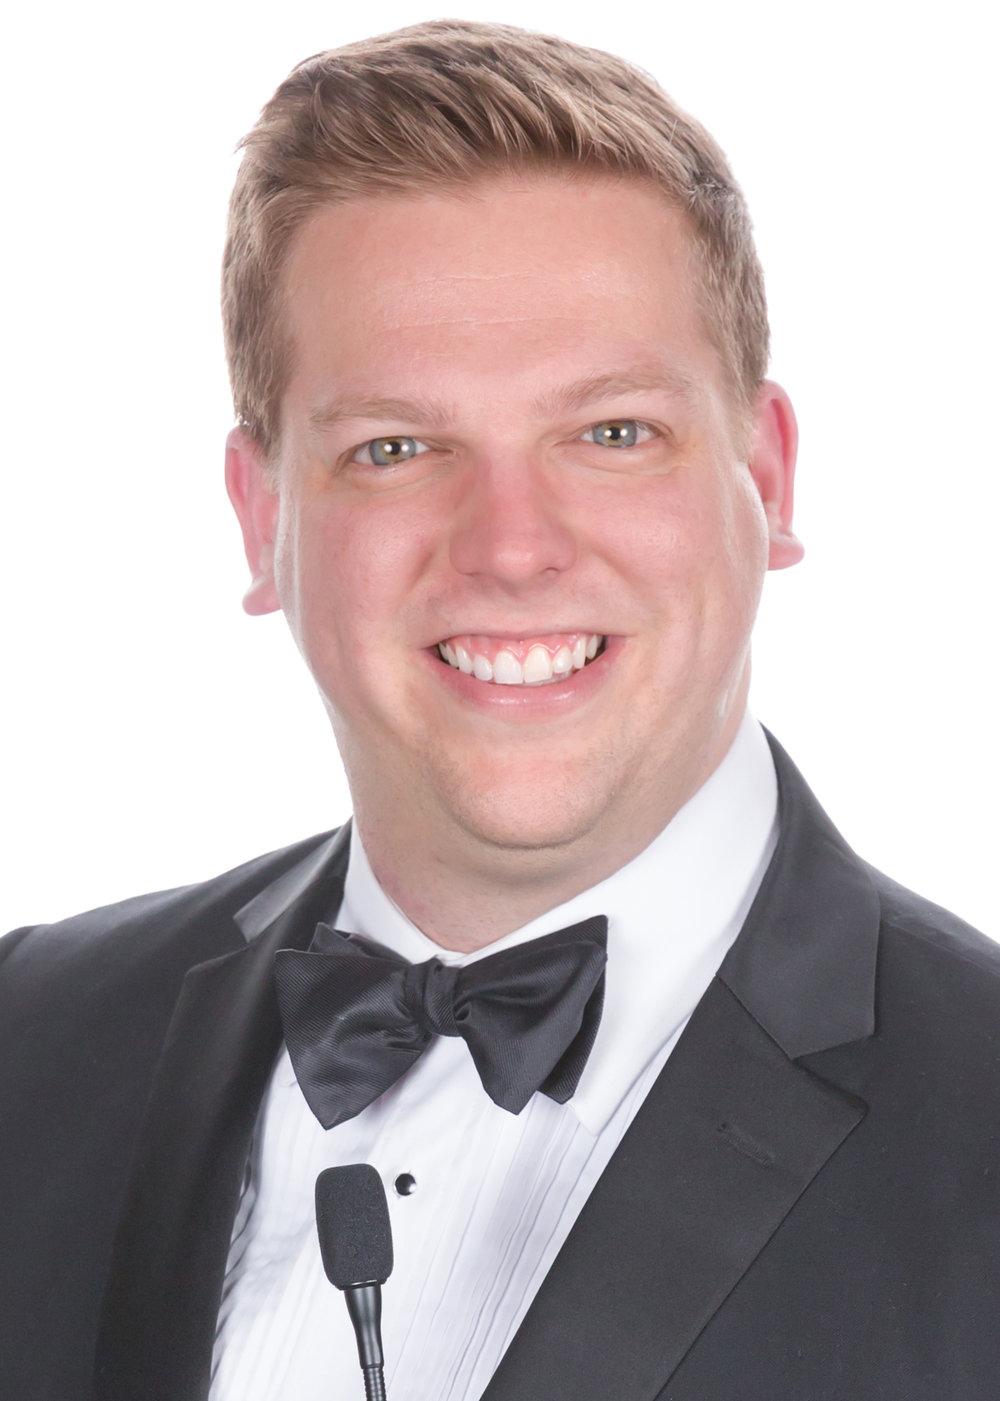 Clark Ramsey | Executive Producer & Host On staff since 2011